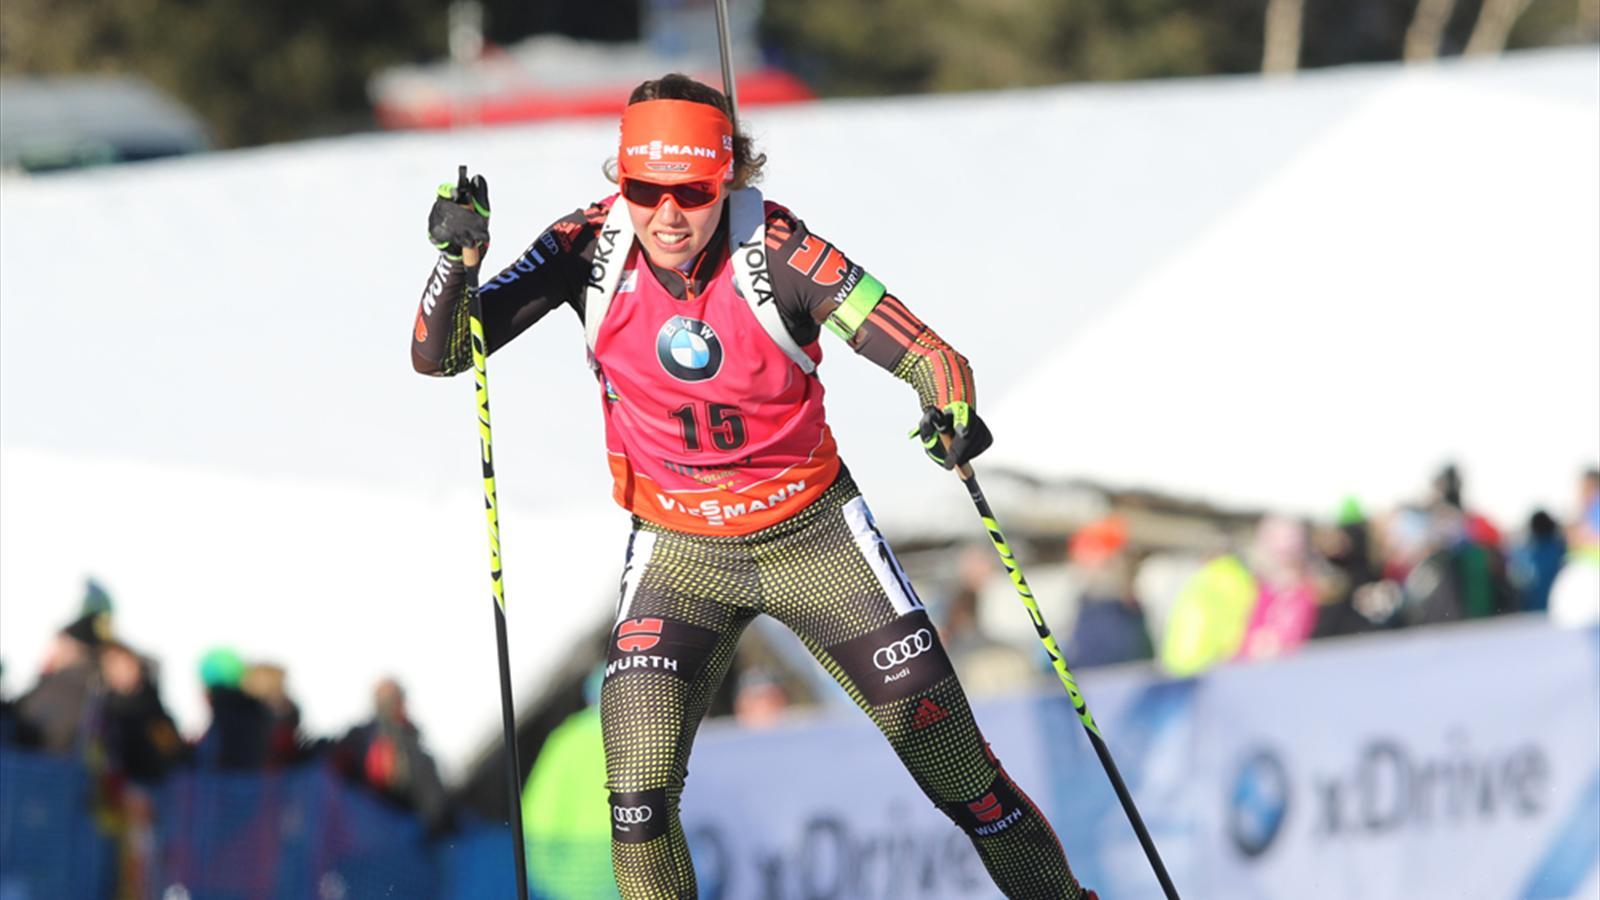 Biathlon Massenstart